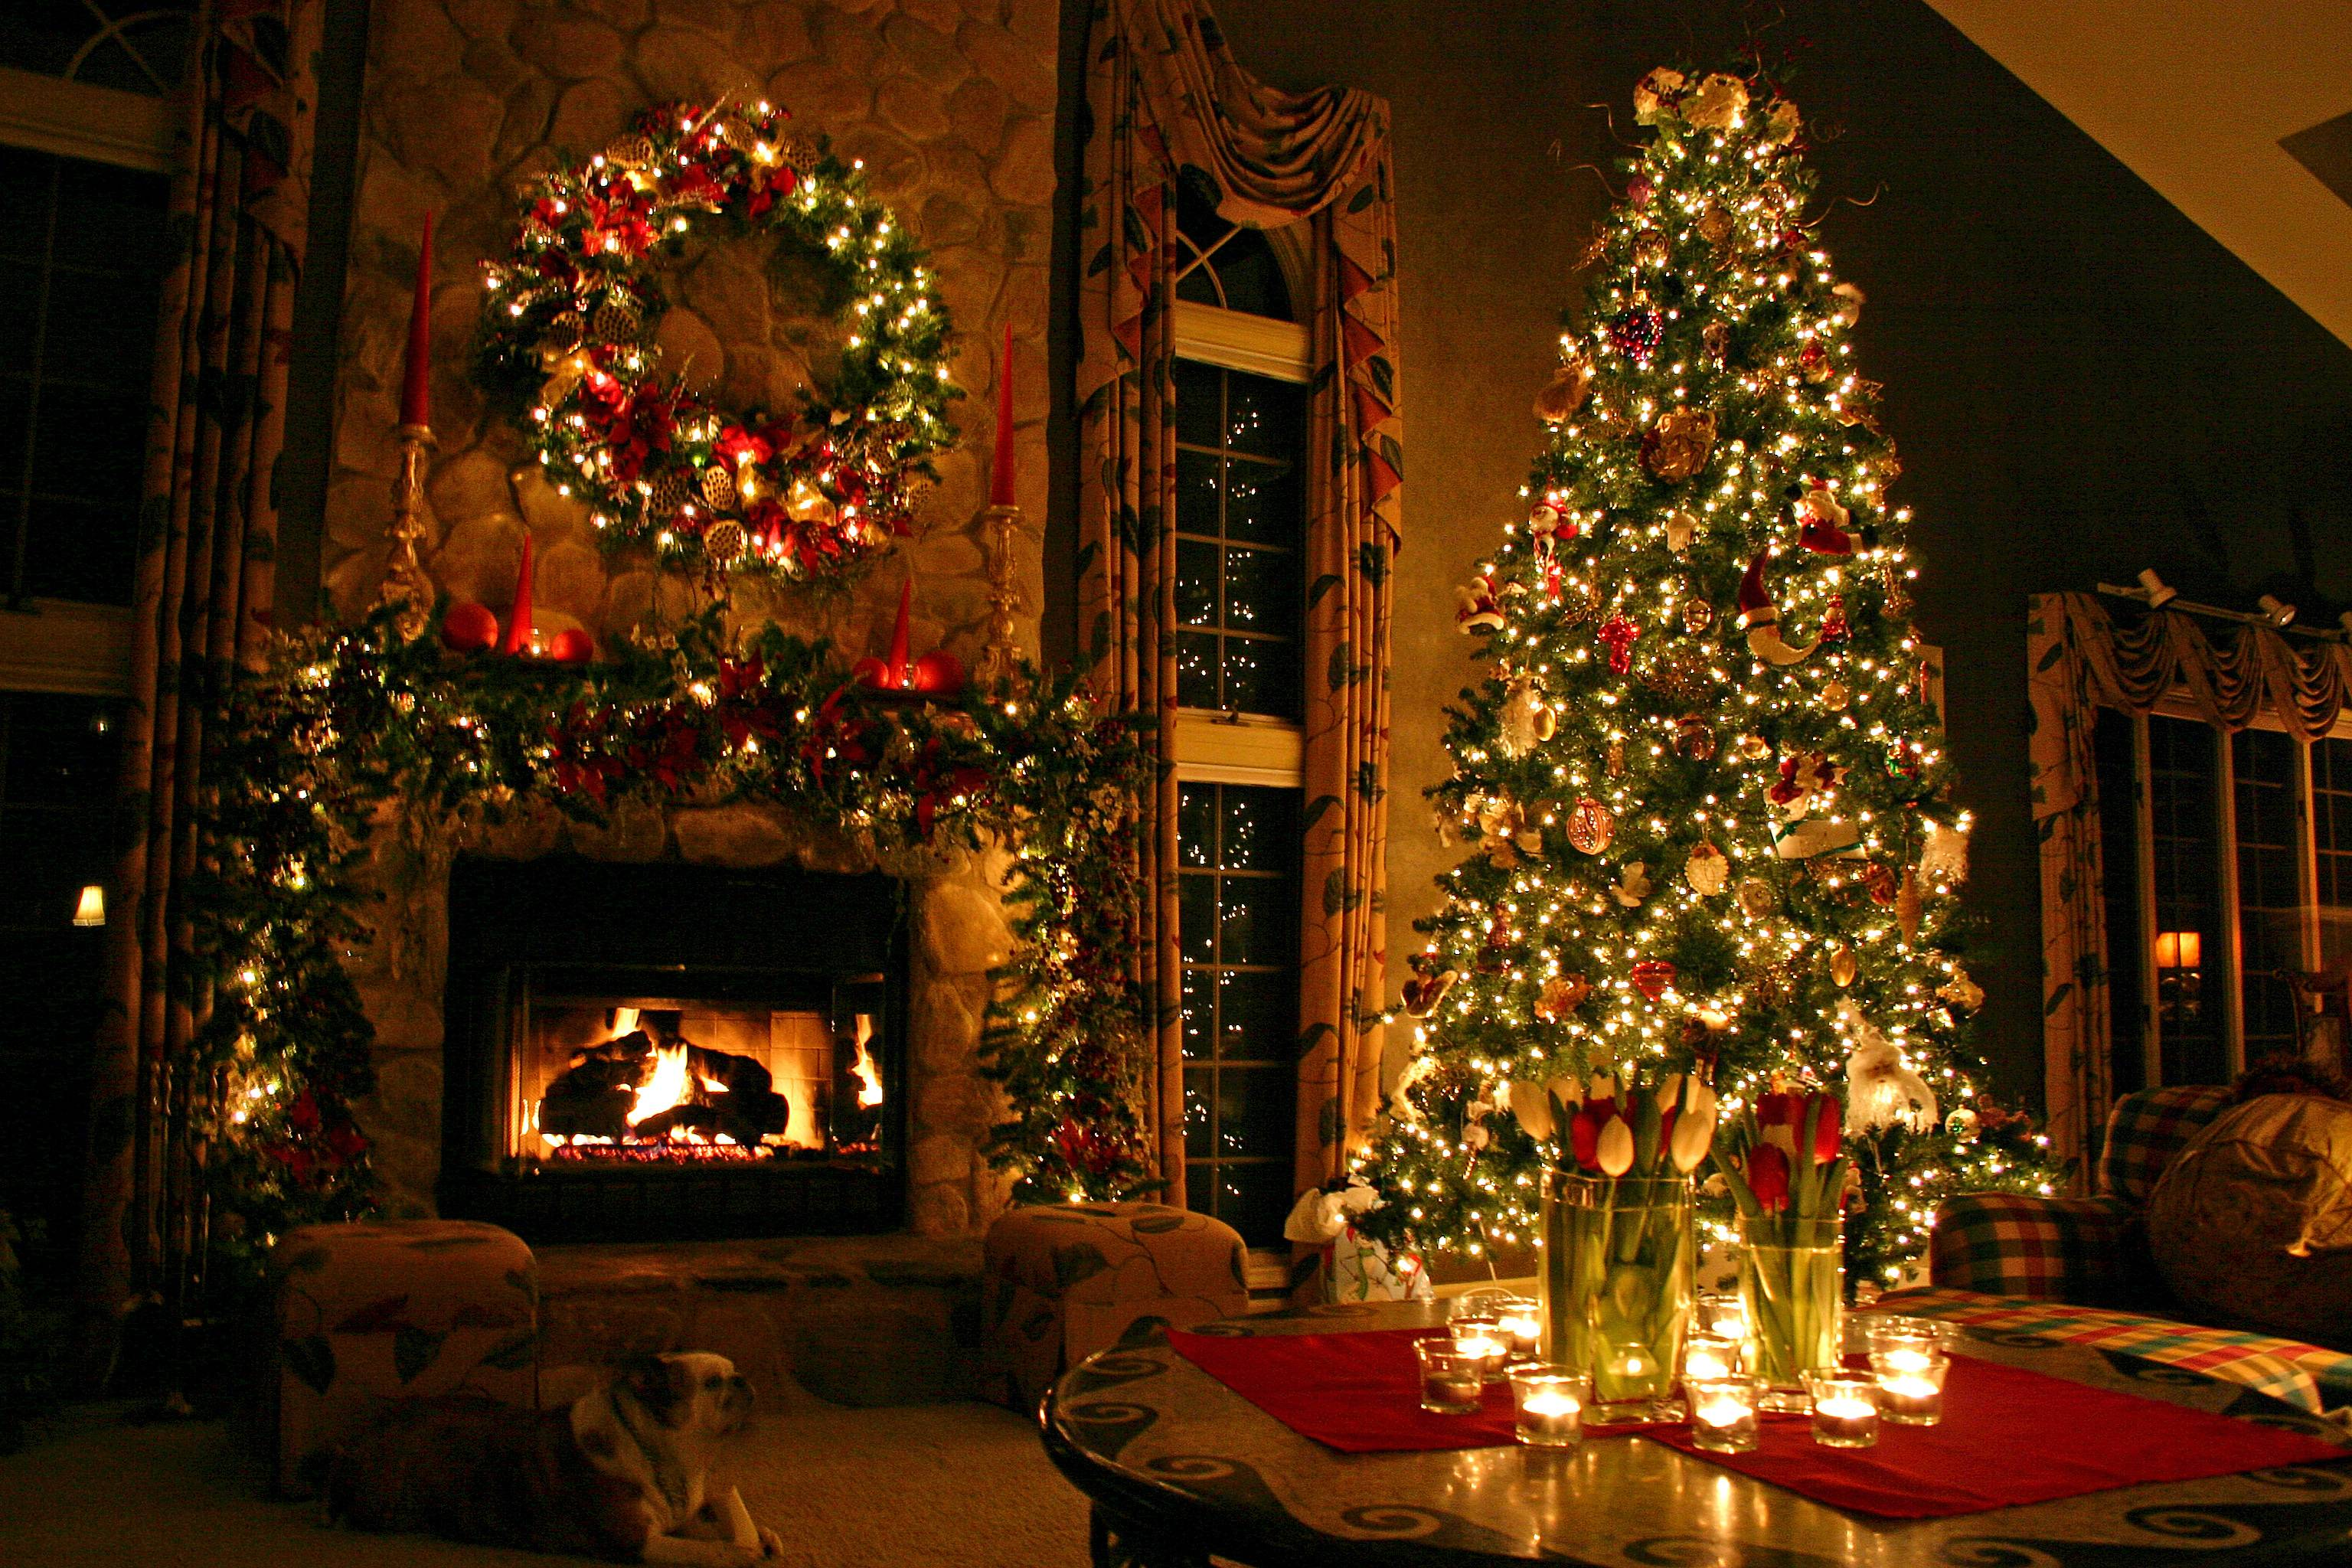 Wallpaper Fireplace Desktop Tree Christmas